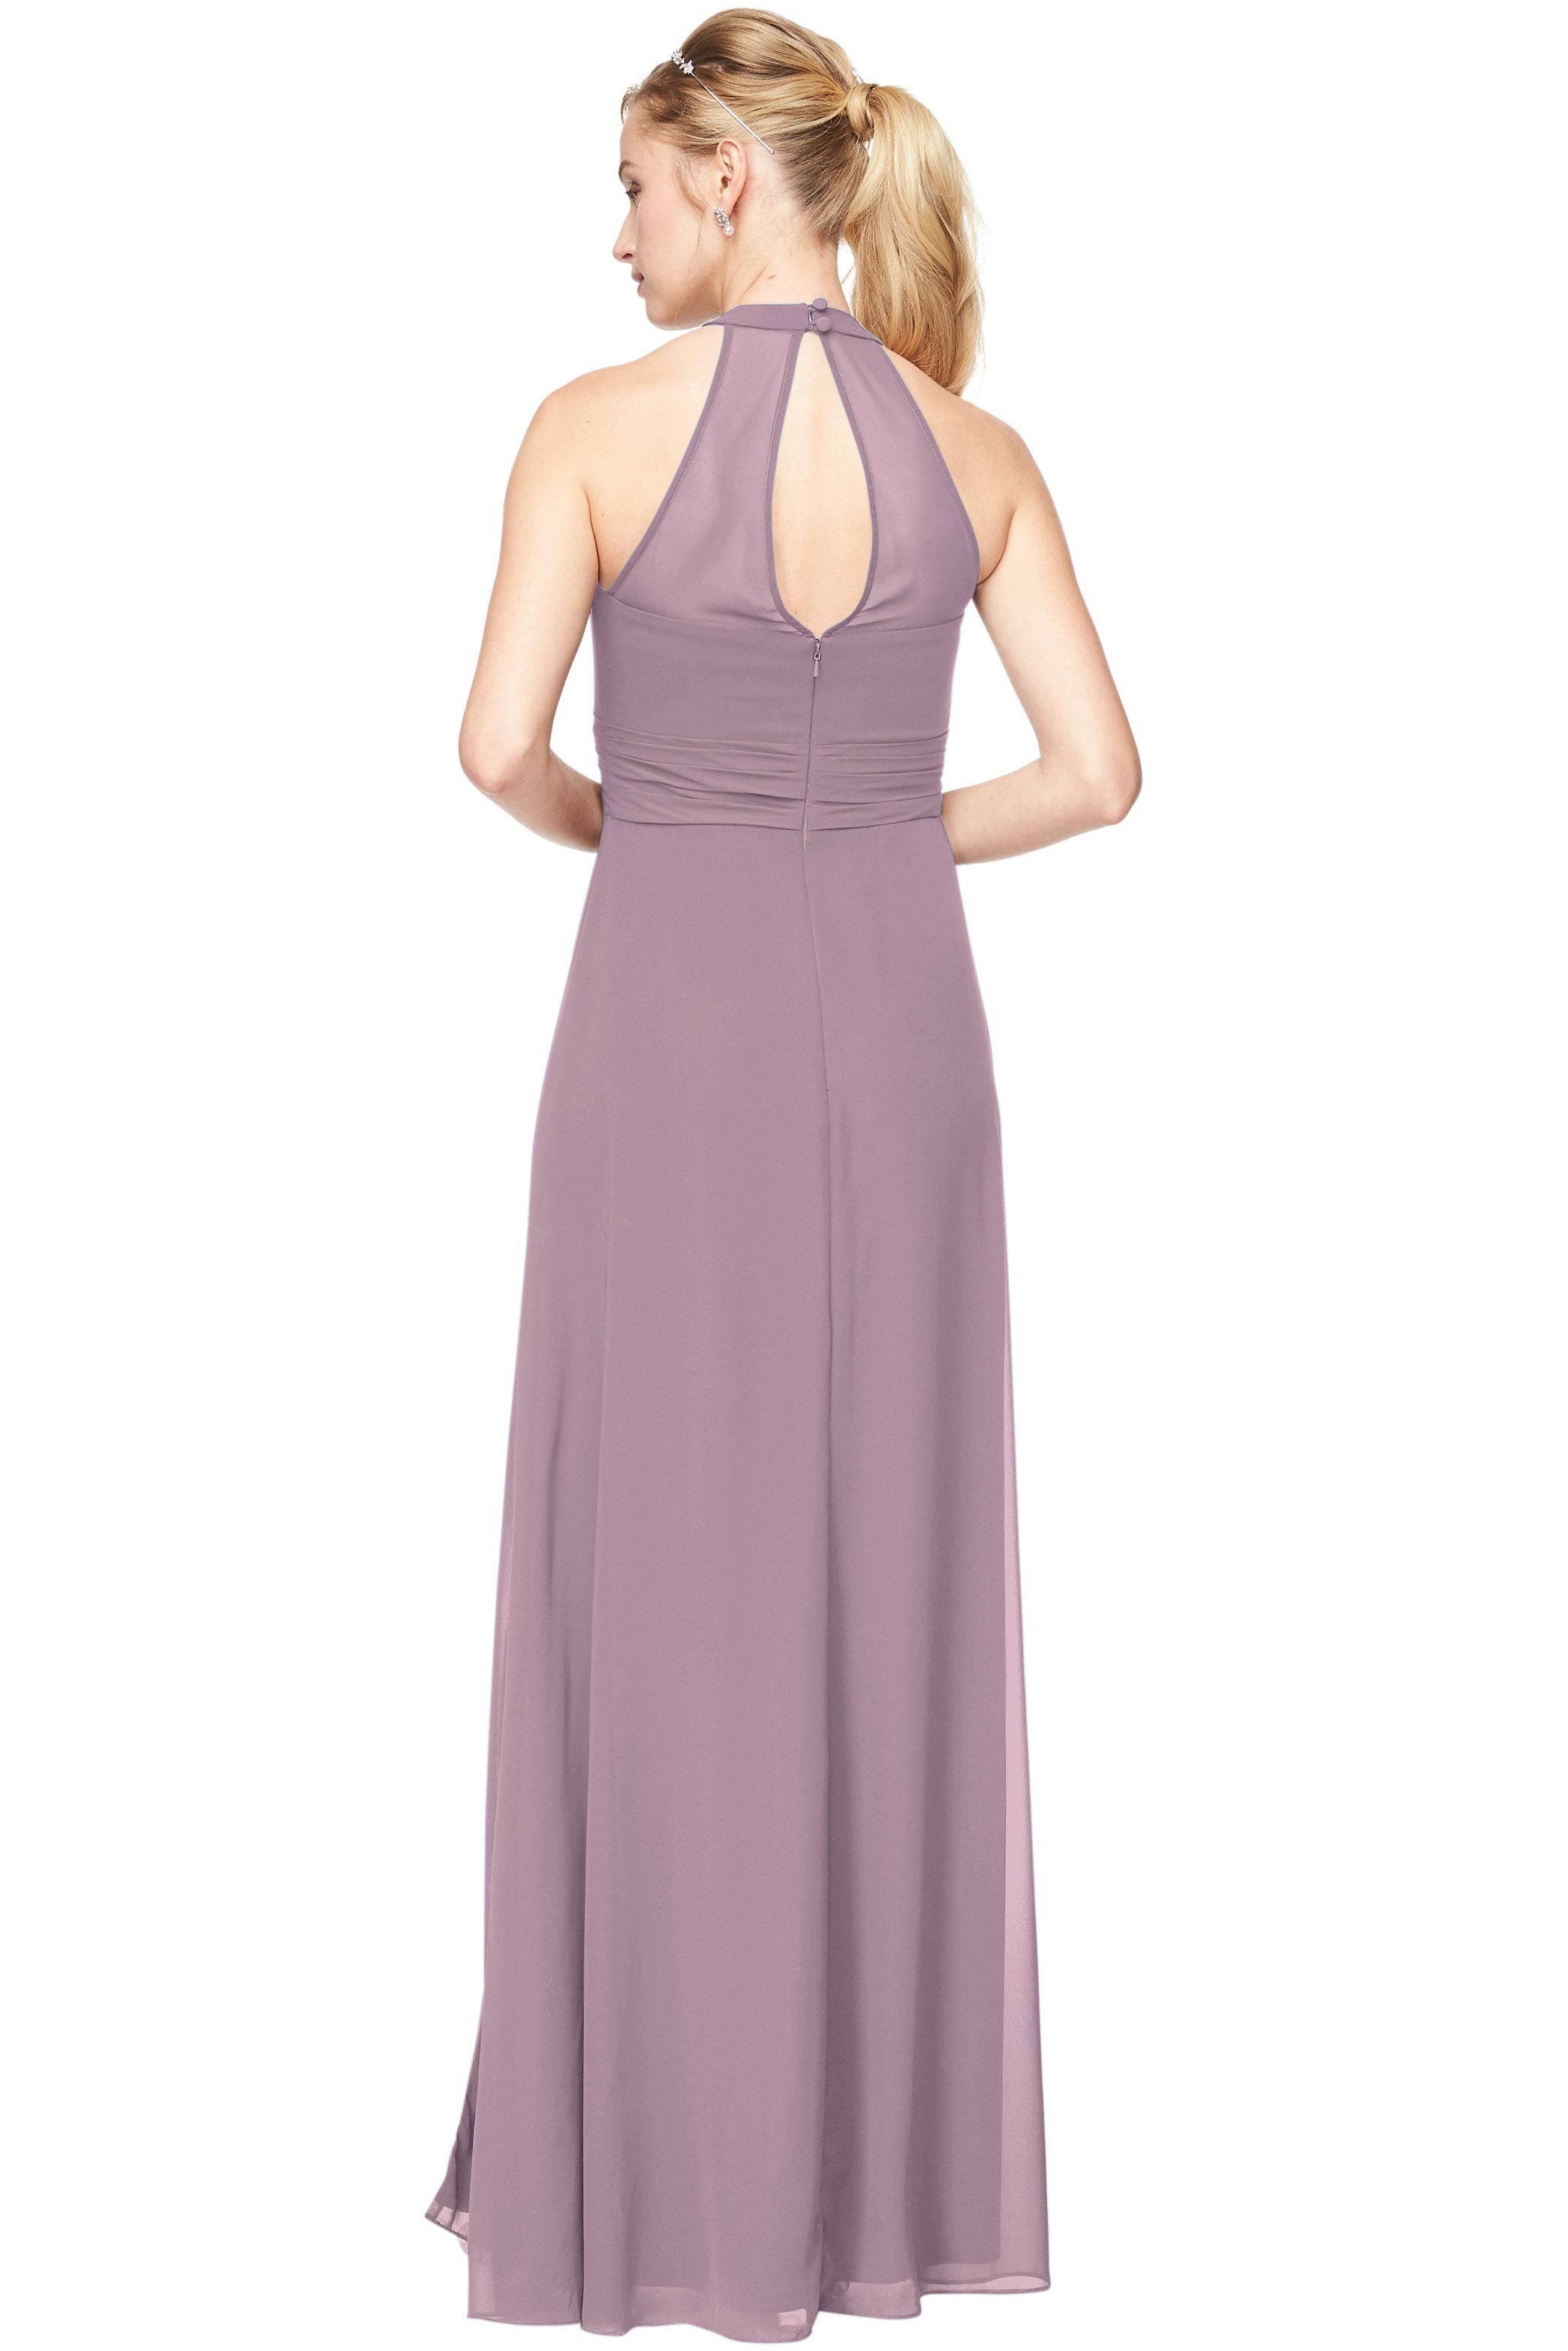 Bill Levkoff HEATHER Chiffon V-Neck A-Line gown, $198.00 Back